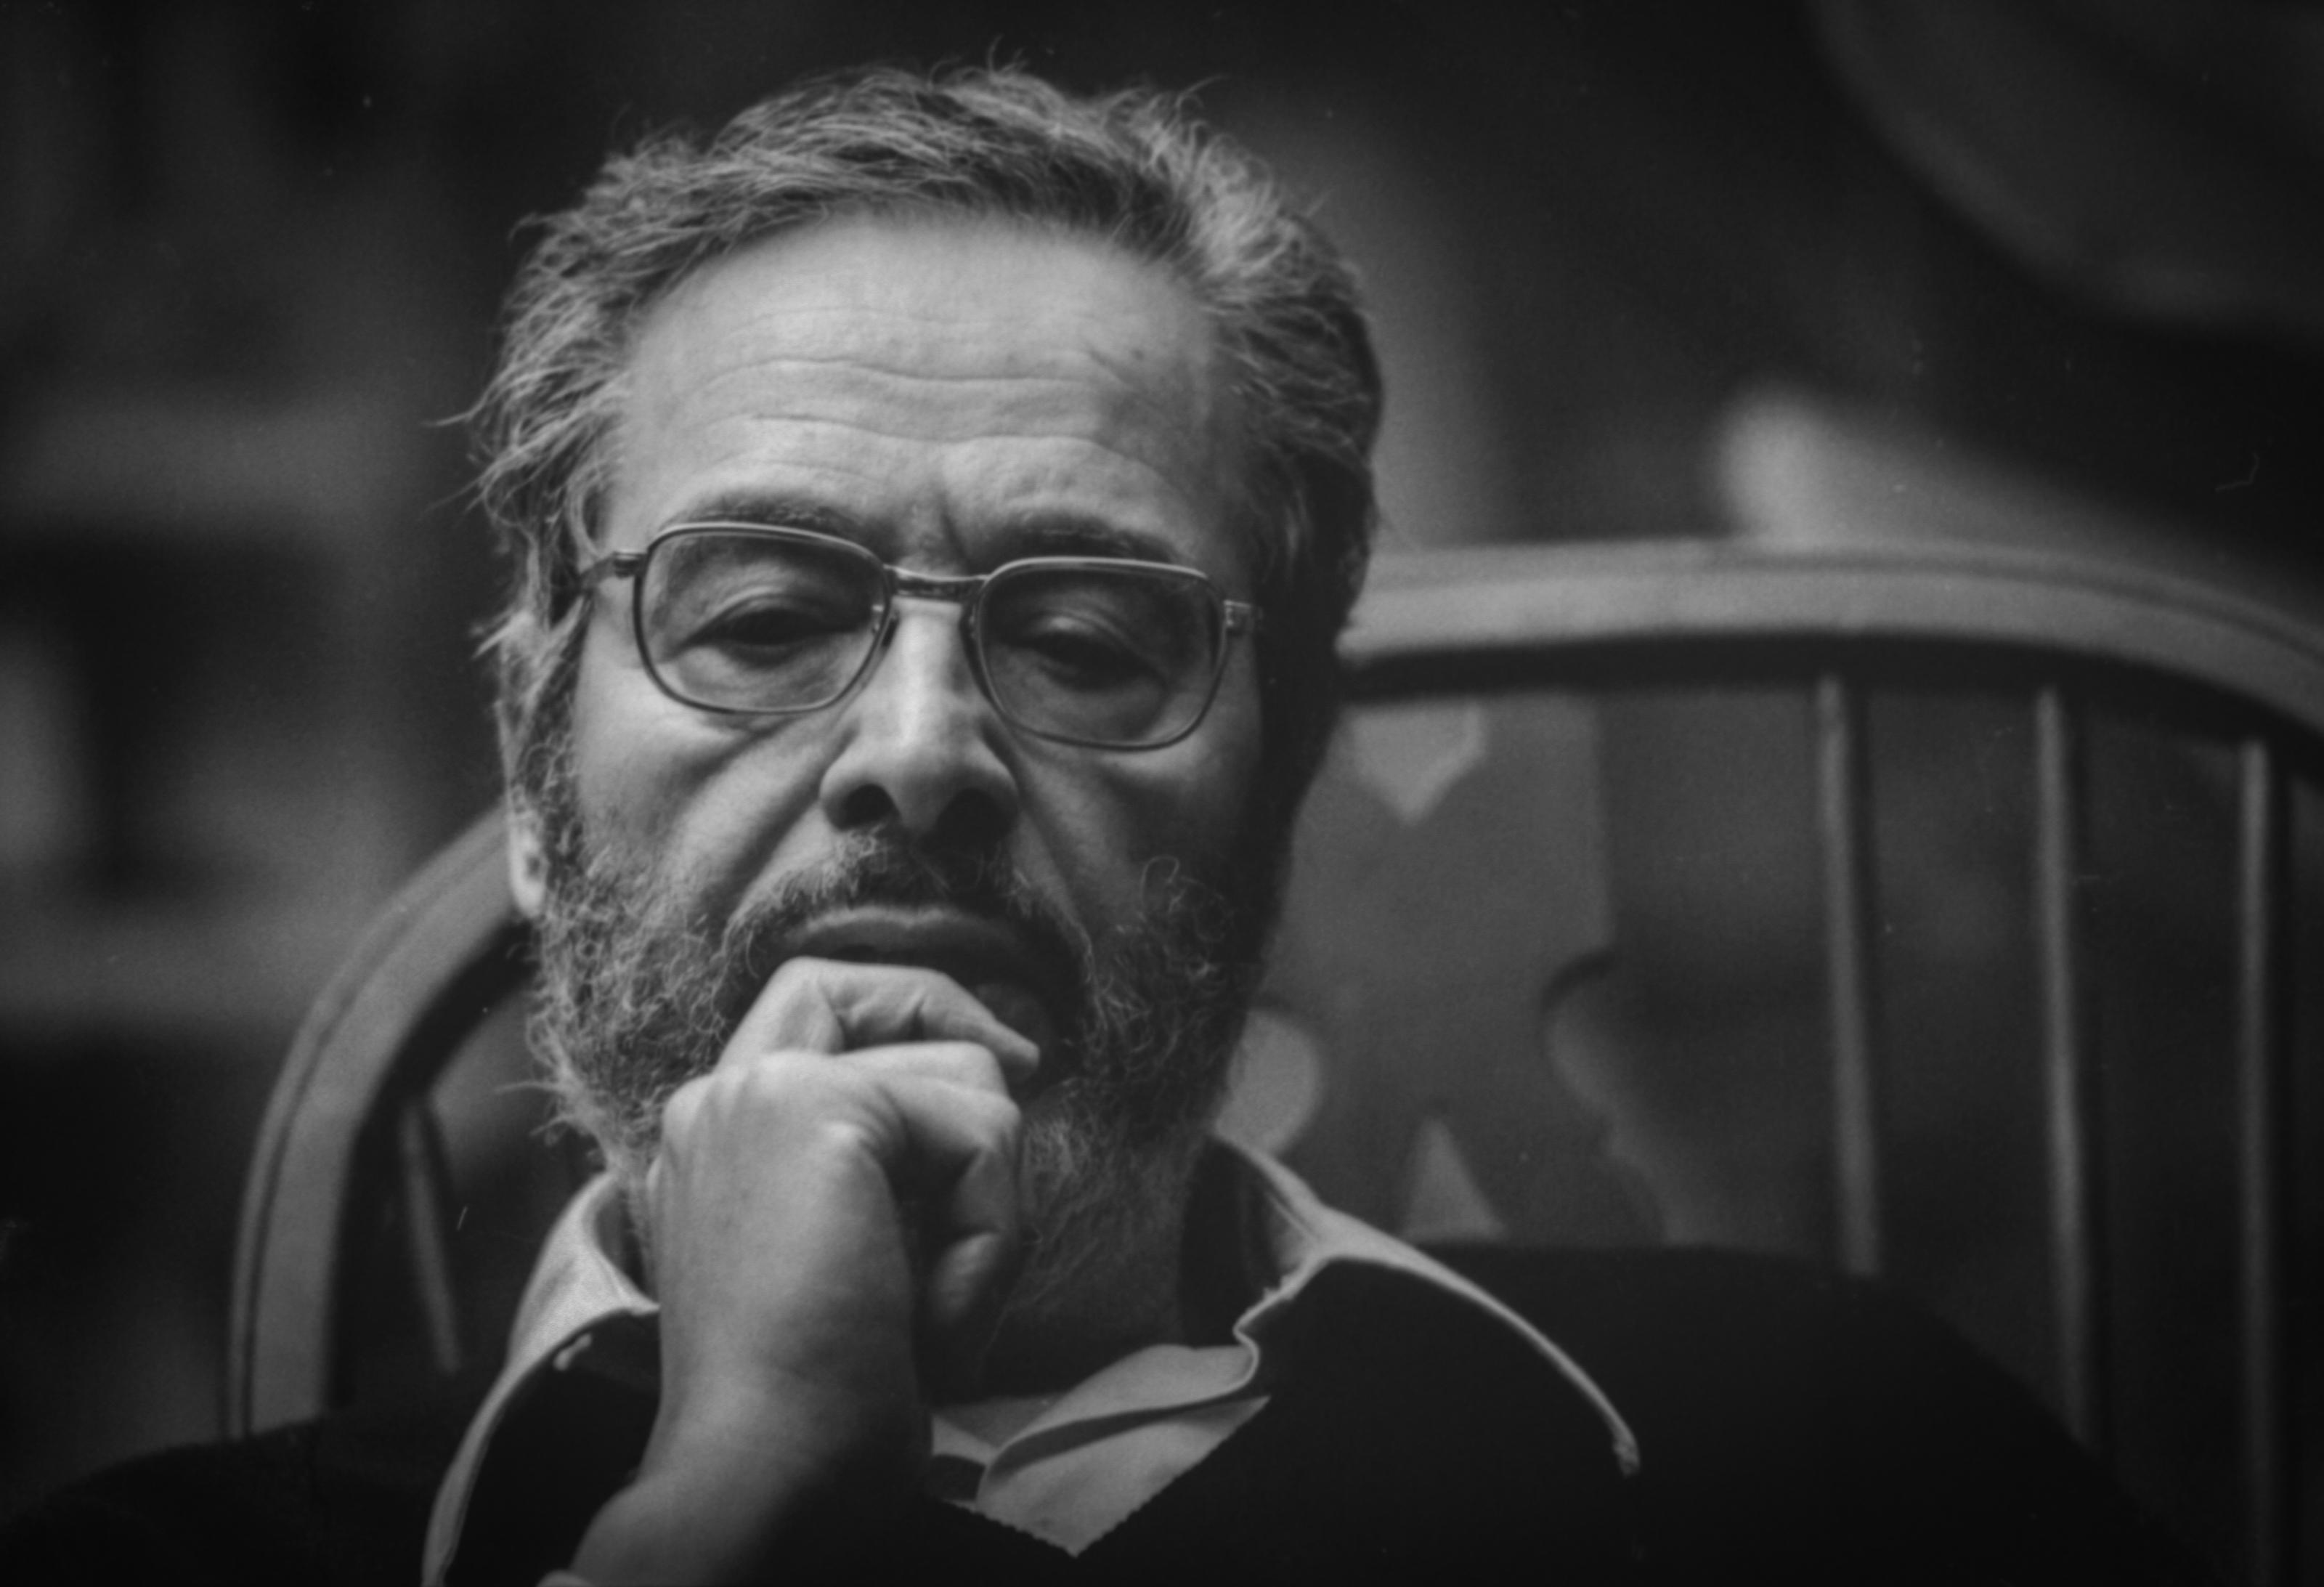 El Hara, en hommage à l'écrivain et penseur Albert Memmi